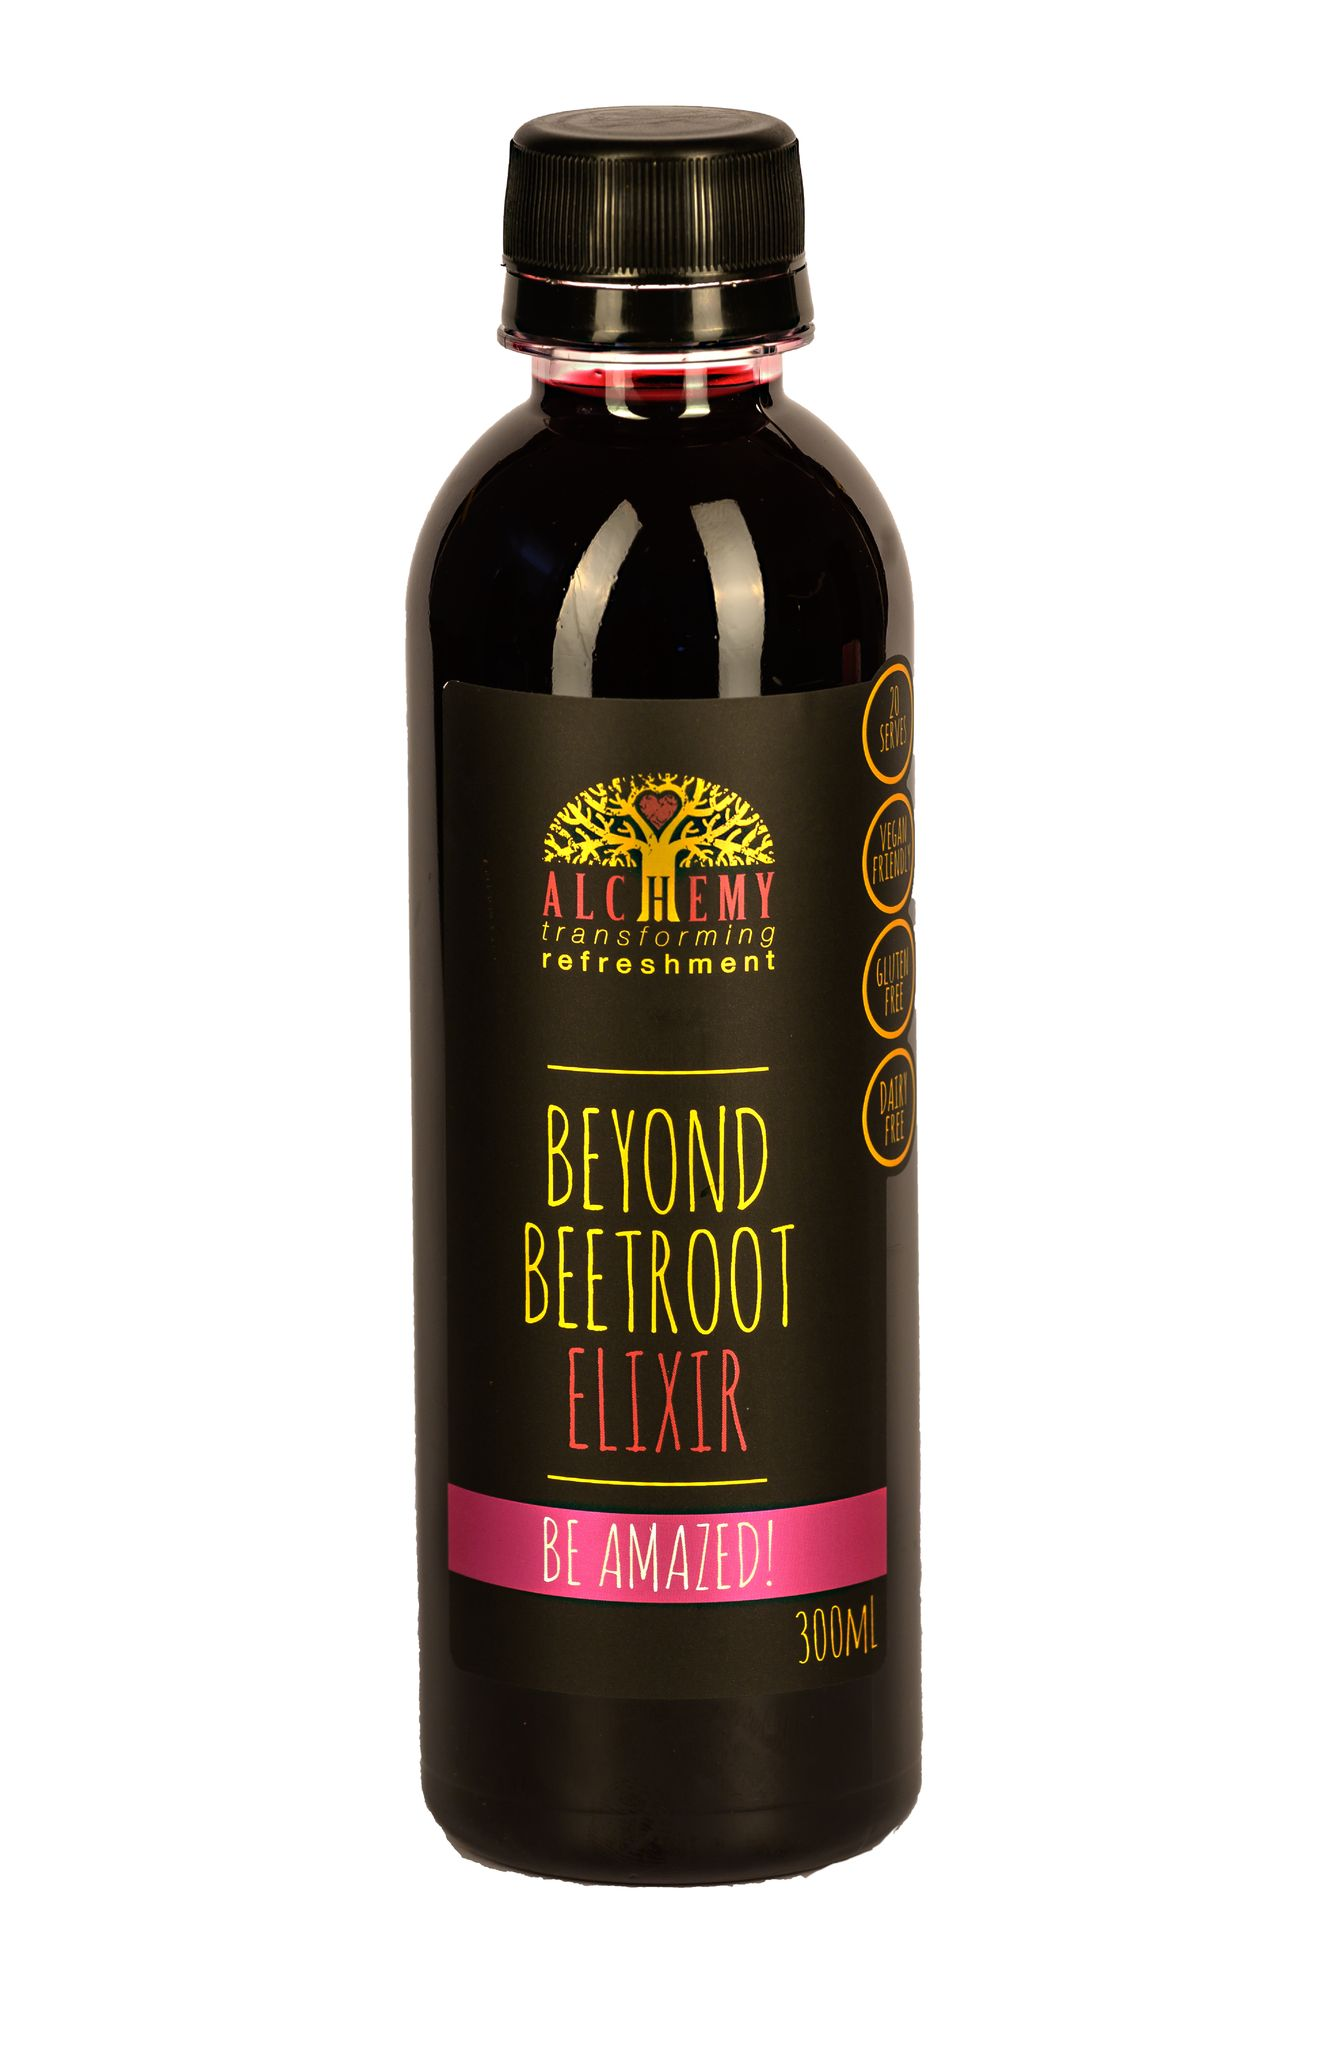 Alchemy Beyond Beetroot 300ml bottles